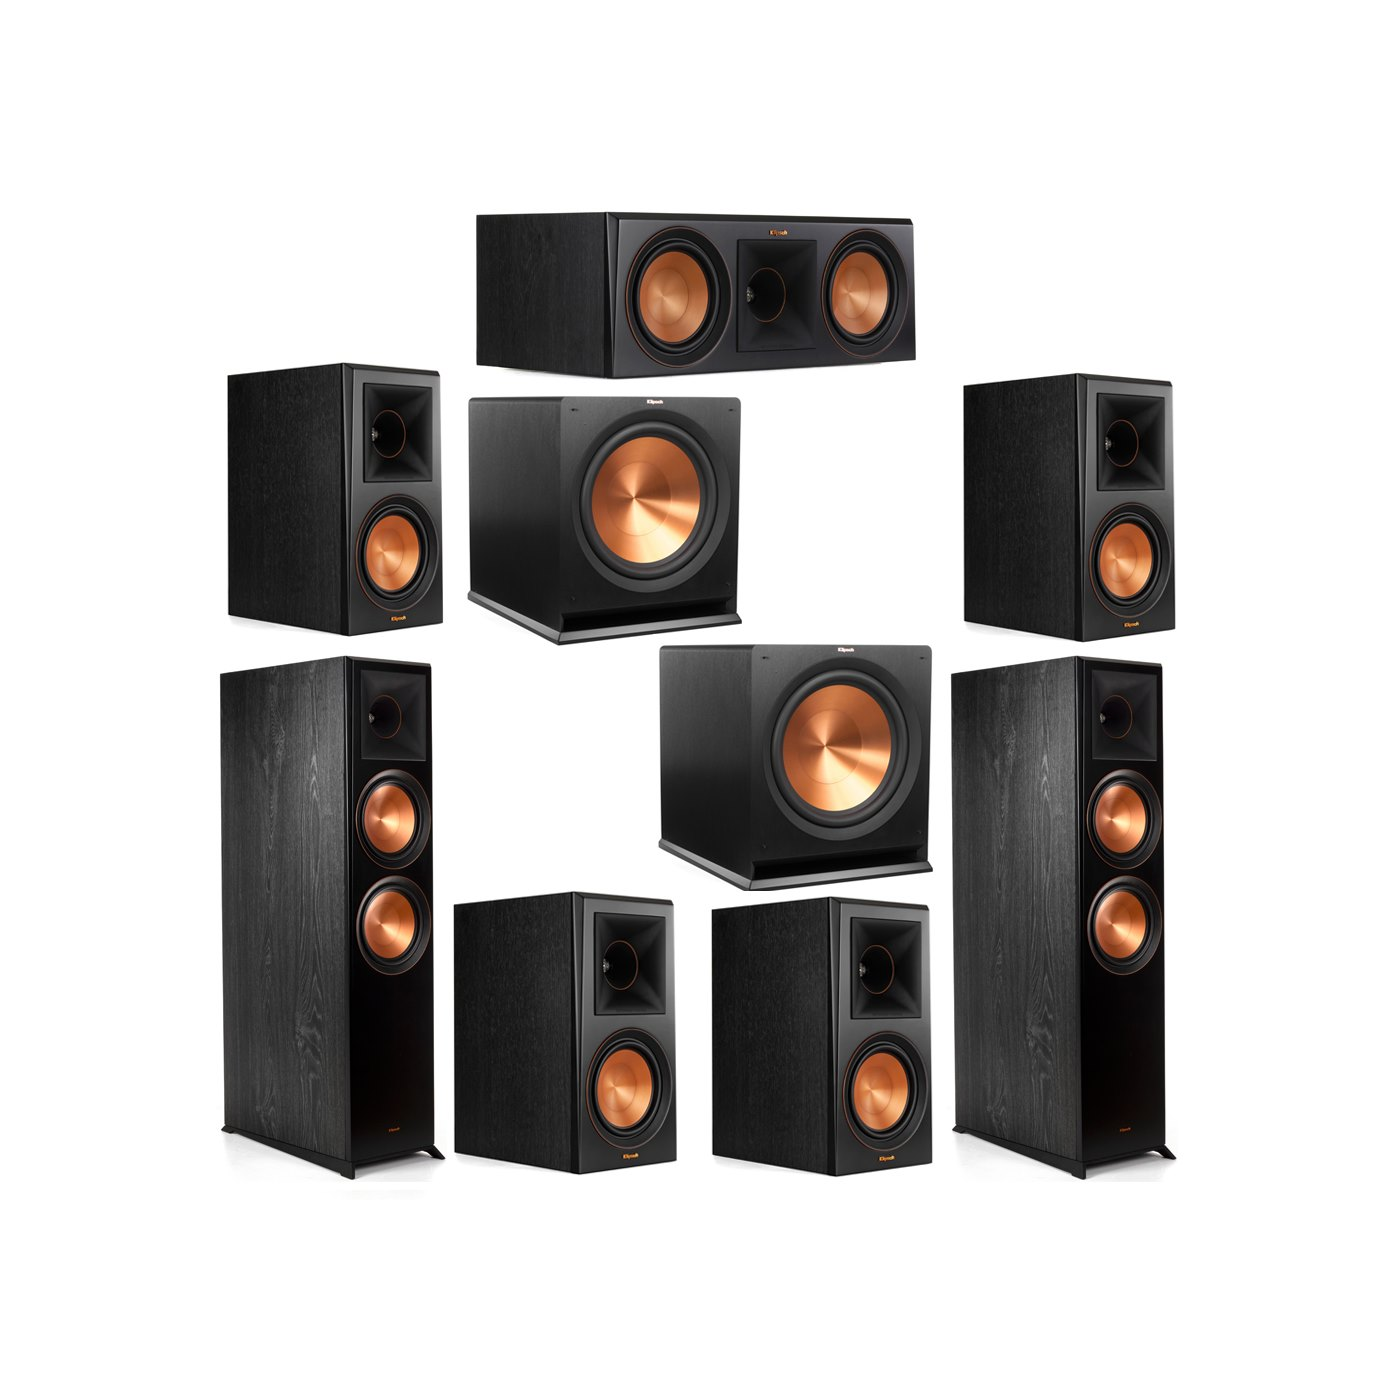 Klipsch 7.2 System with 2 RP-8000F Floorstanding Speakers, 1 Klipsch RP-600C Center Speaker, 4 Klipsch RP-600M Surround Speakers, 2 Klipsch R-115SW Subwoofers